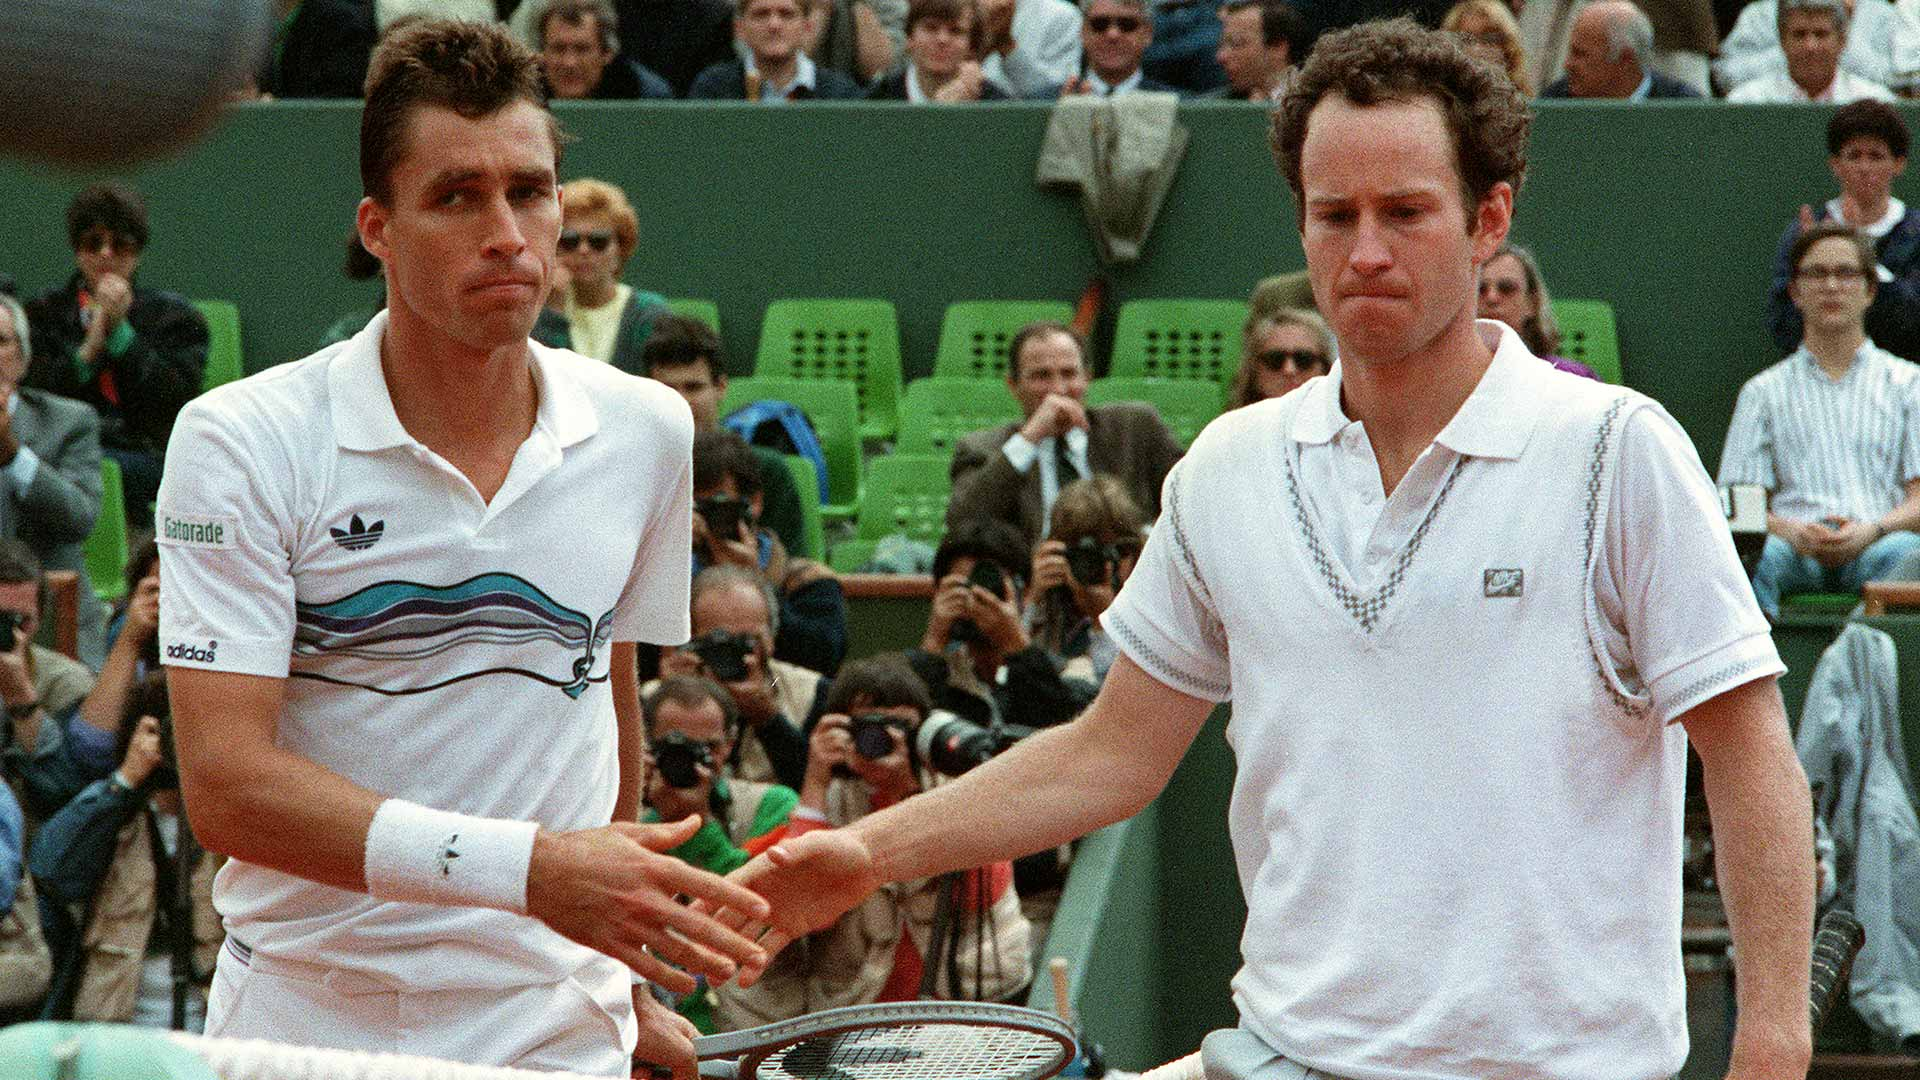 Lendl and McEnroe